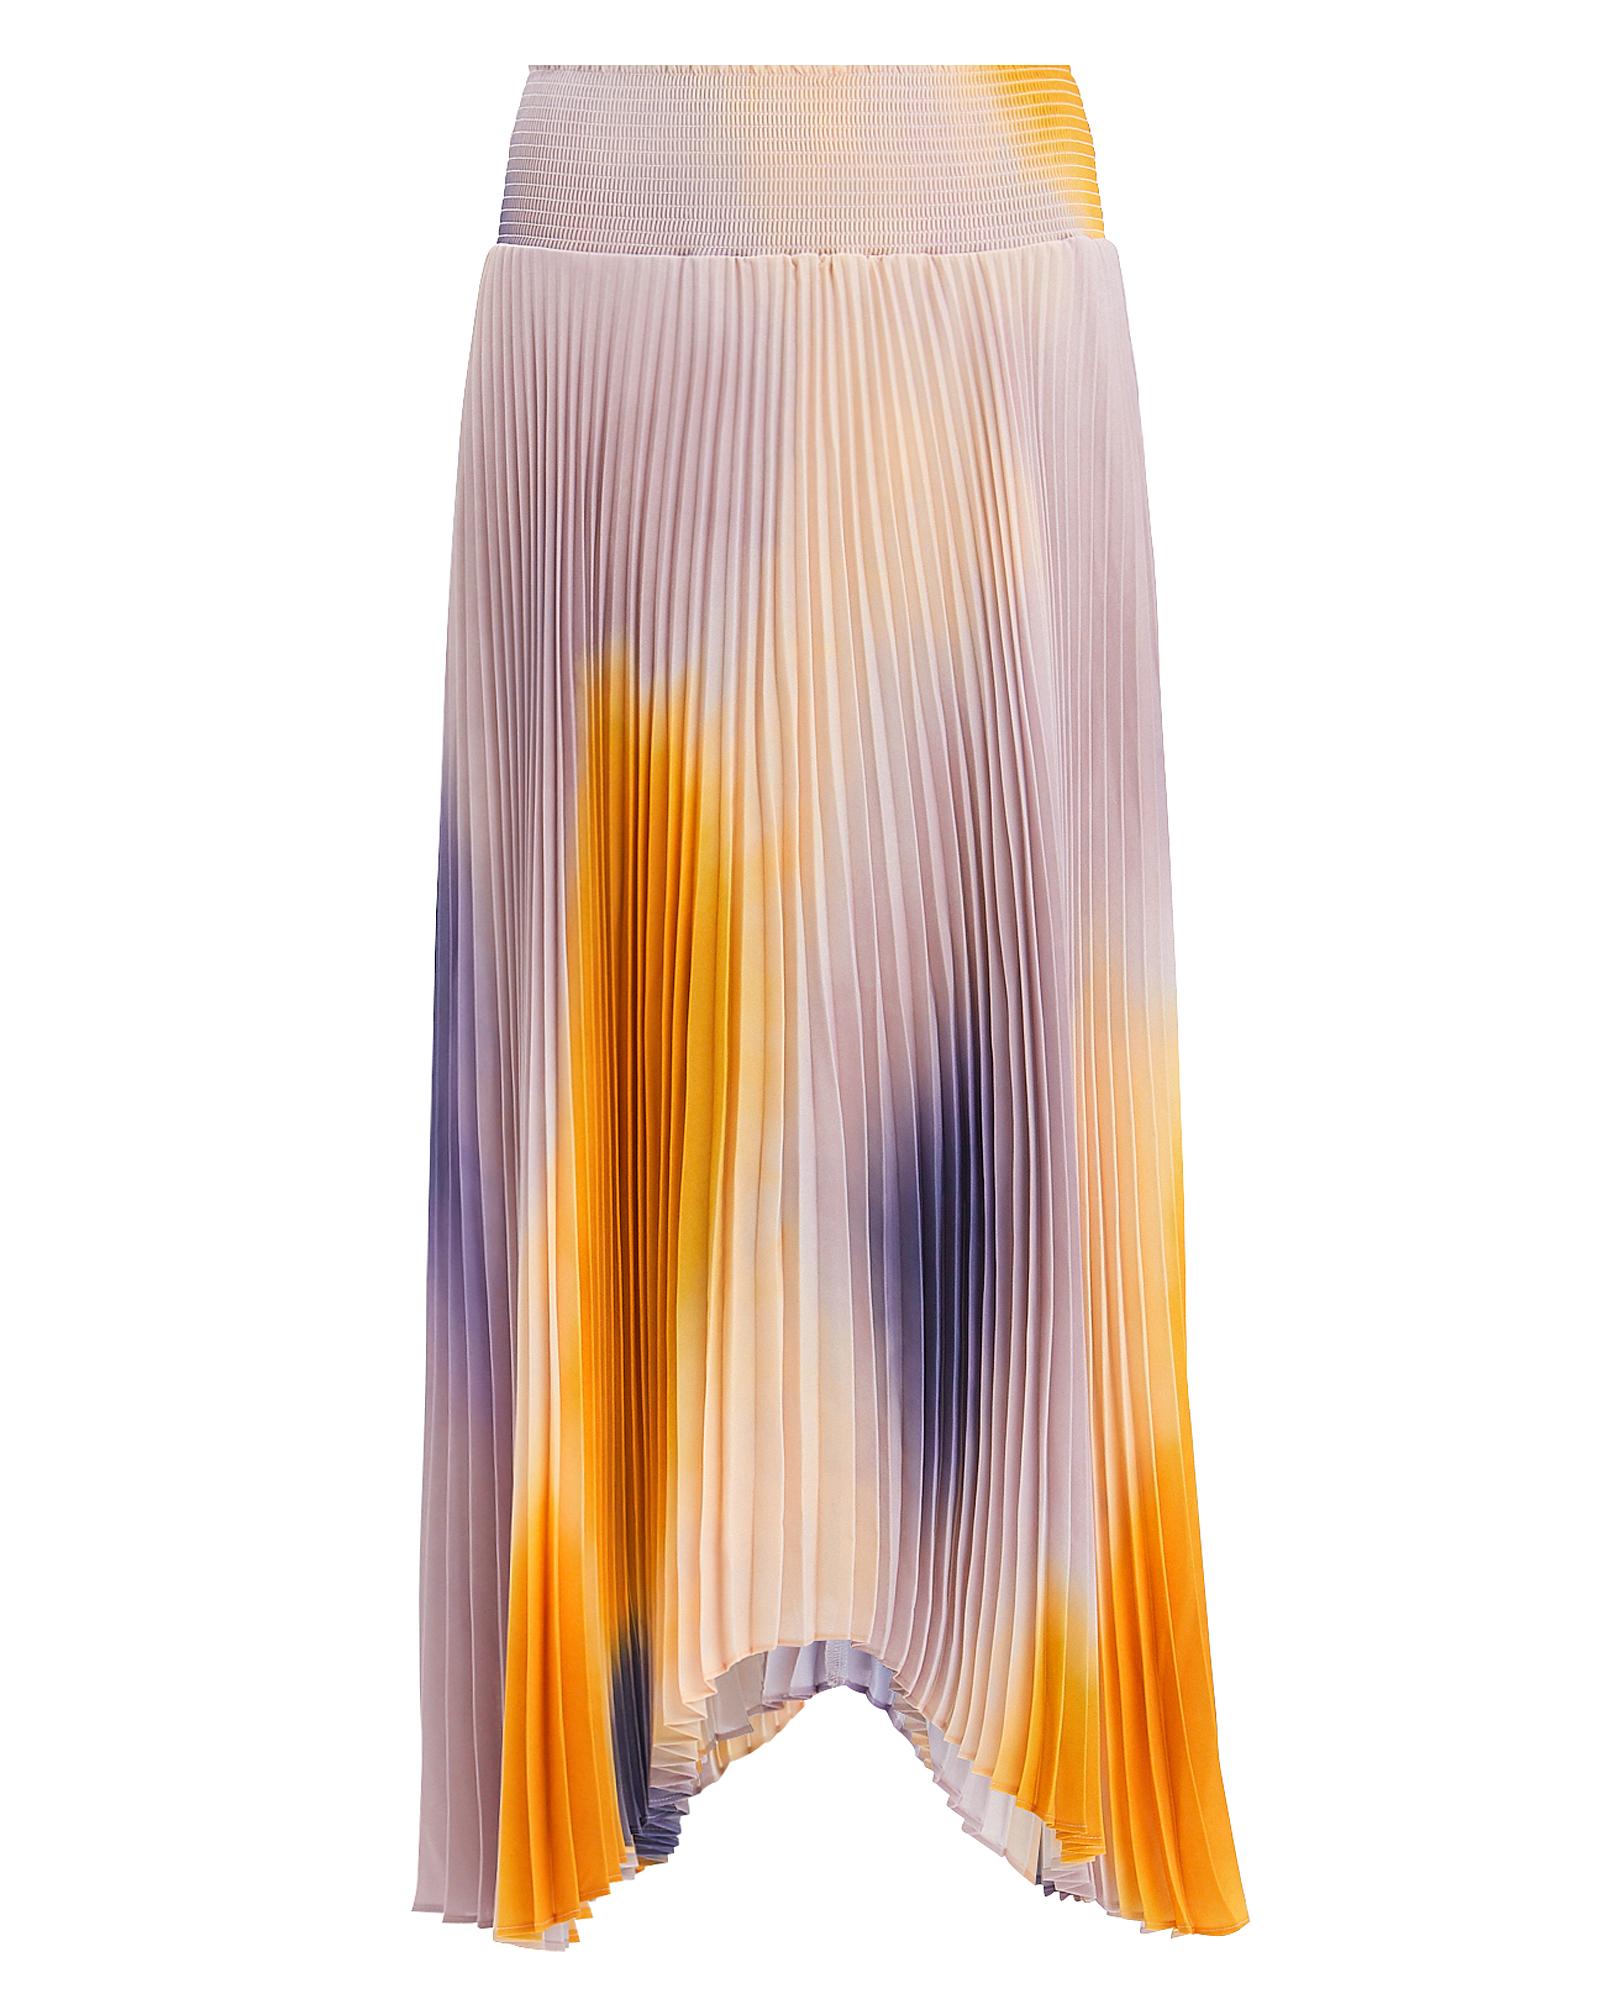 A.l.c Skirts A.L.C. SONALI OMBRé  MIDI SKIRT  ORANGE/PURPLE/BLUSH S